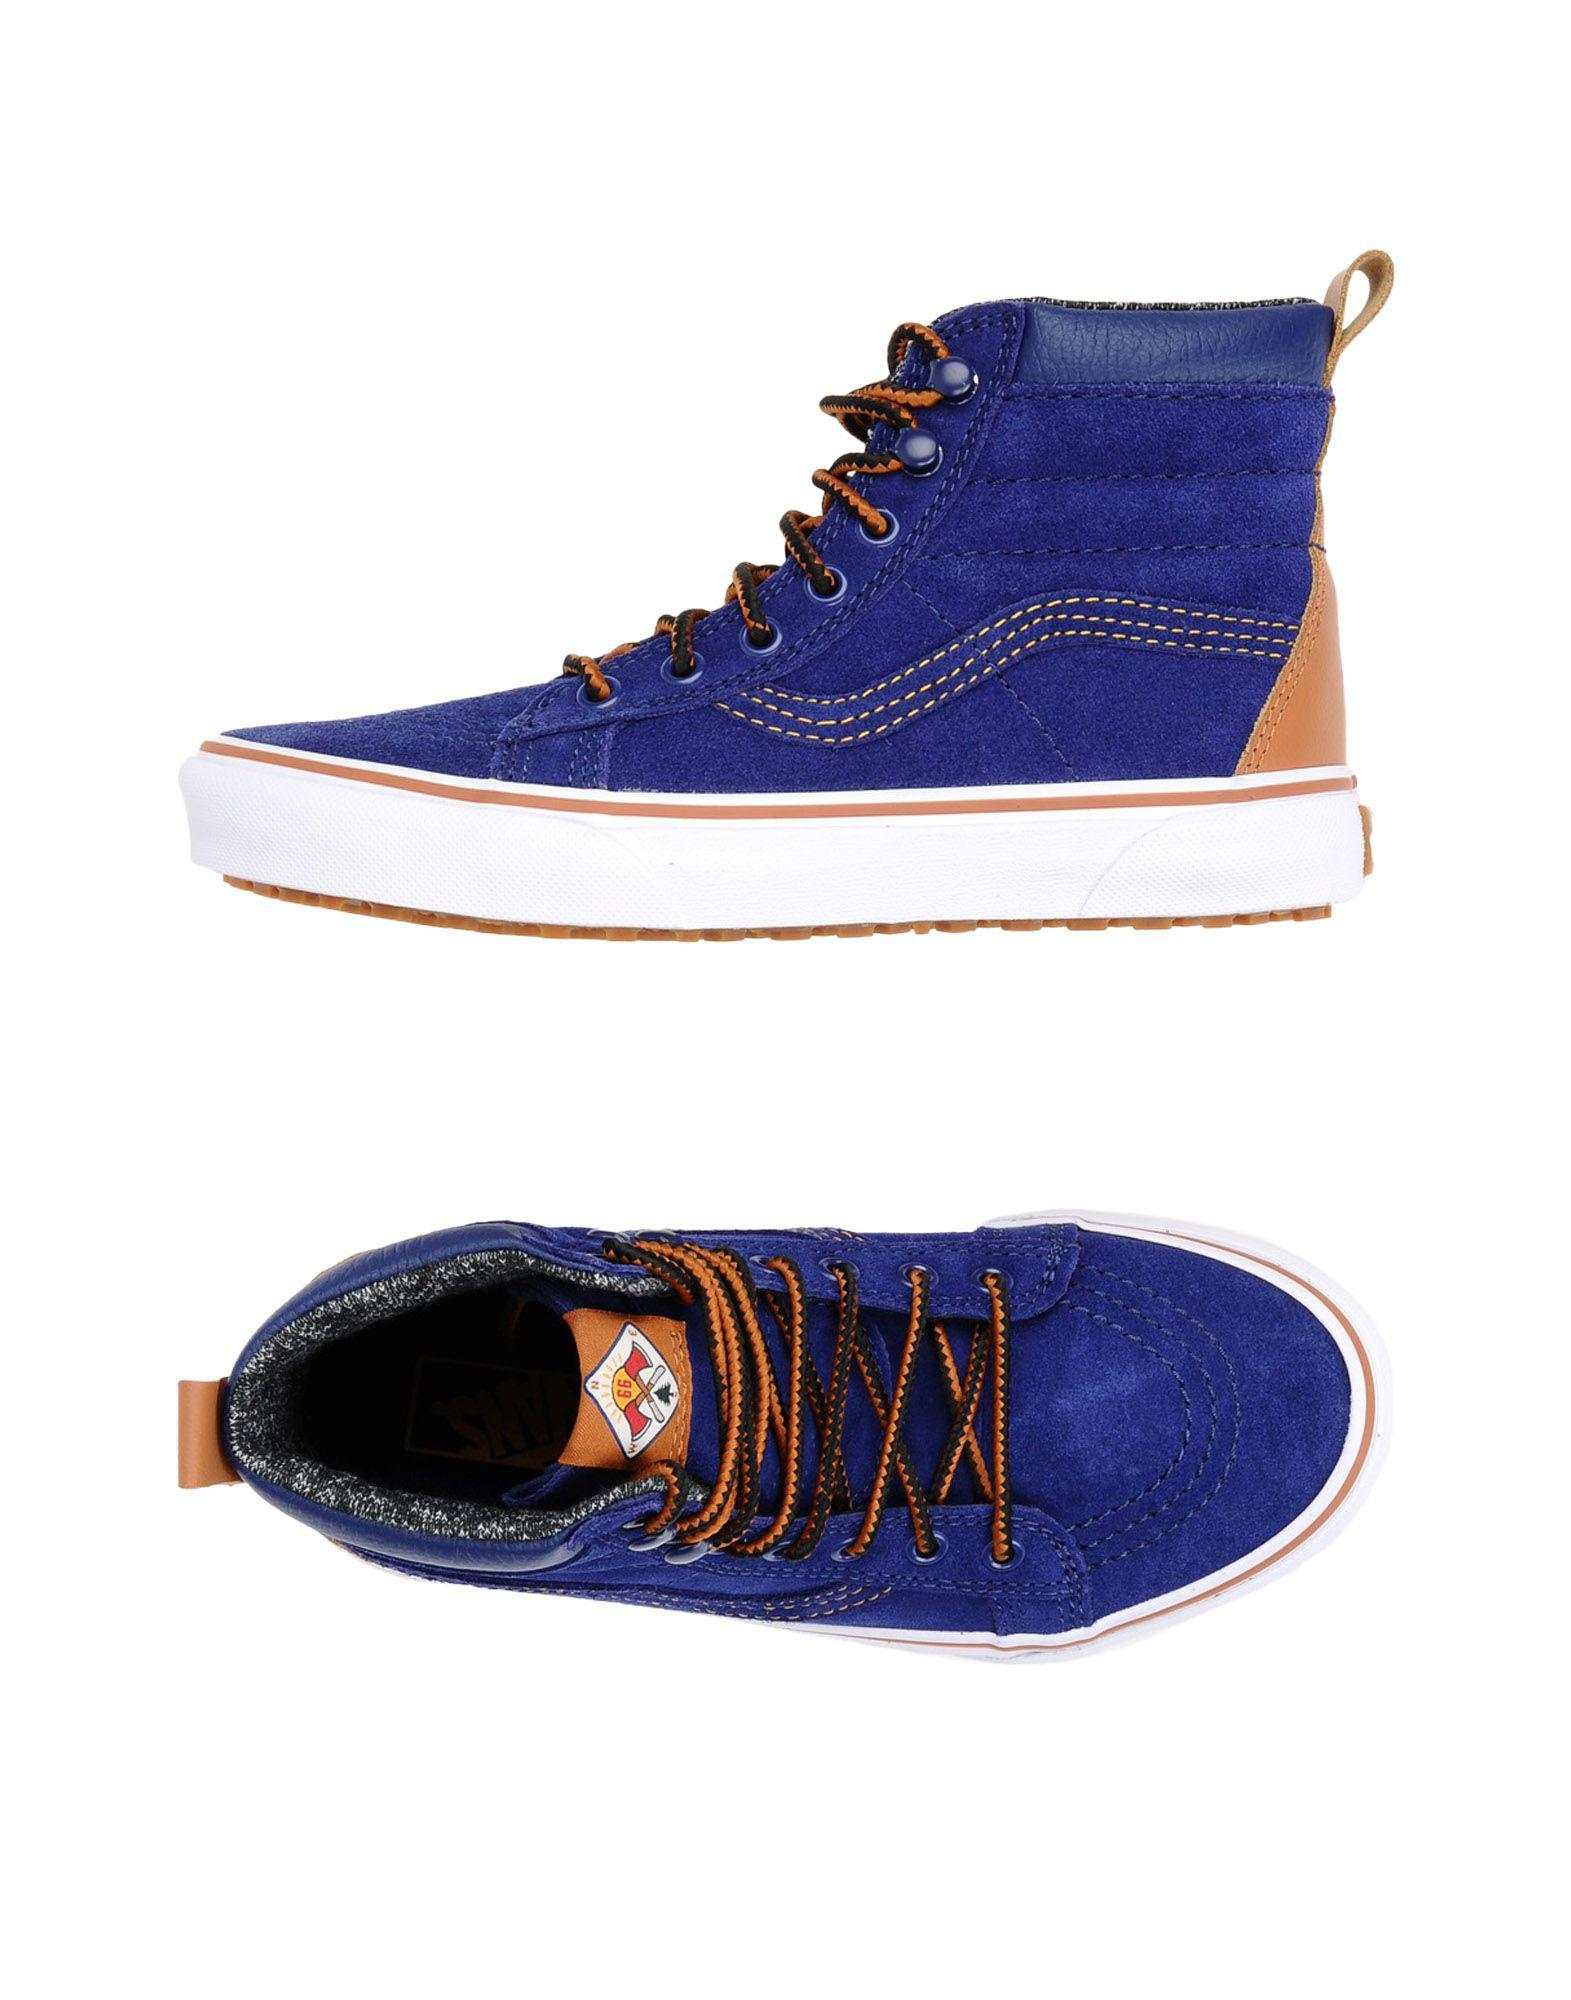 61443acfdd Lyst - Vans High-tops   Sneakers in Blue for Men